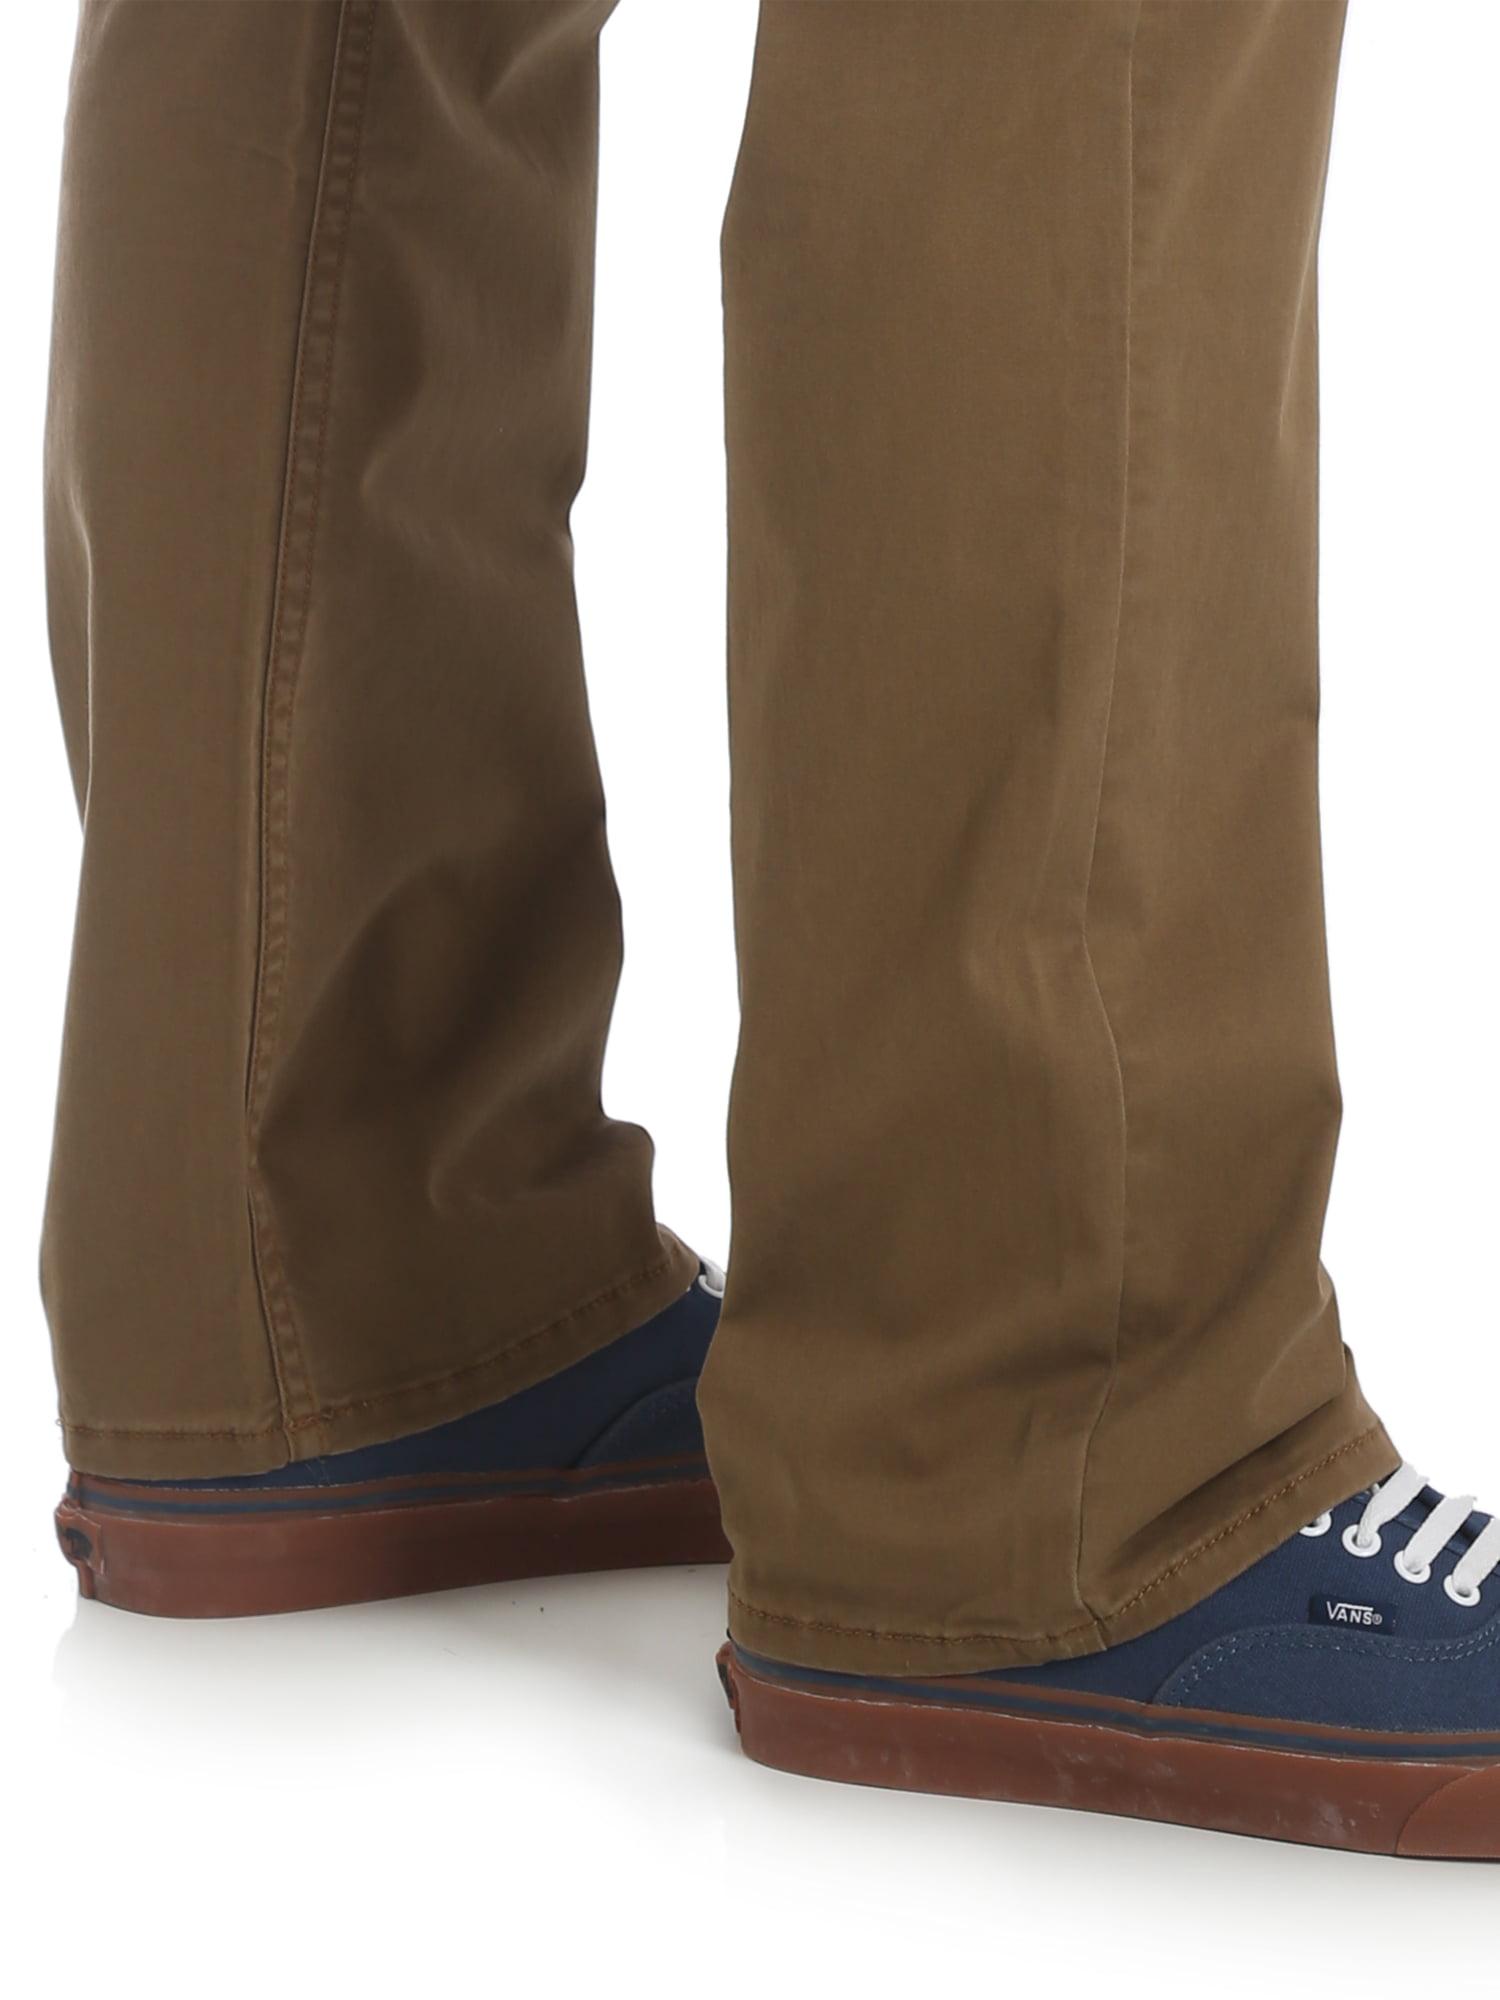 Wrangler - Men s Straight Fit 5 Pocket Pant - Walmart.com 33df674345